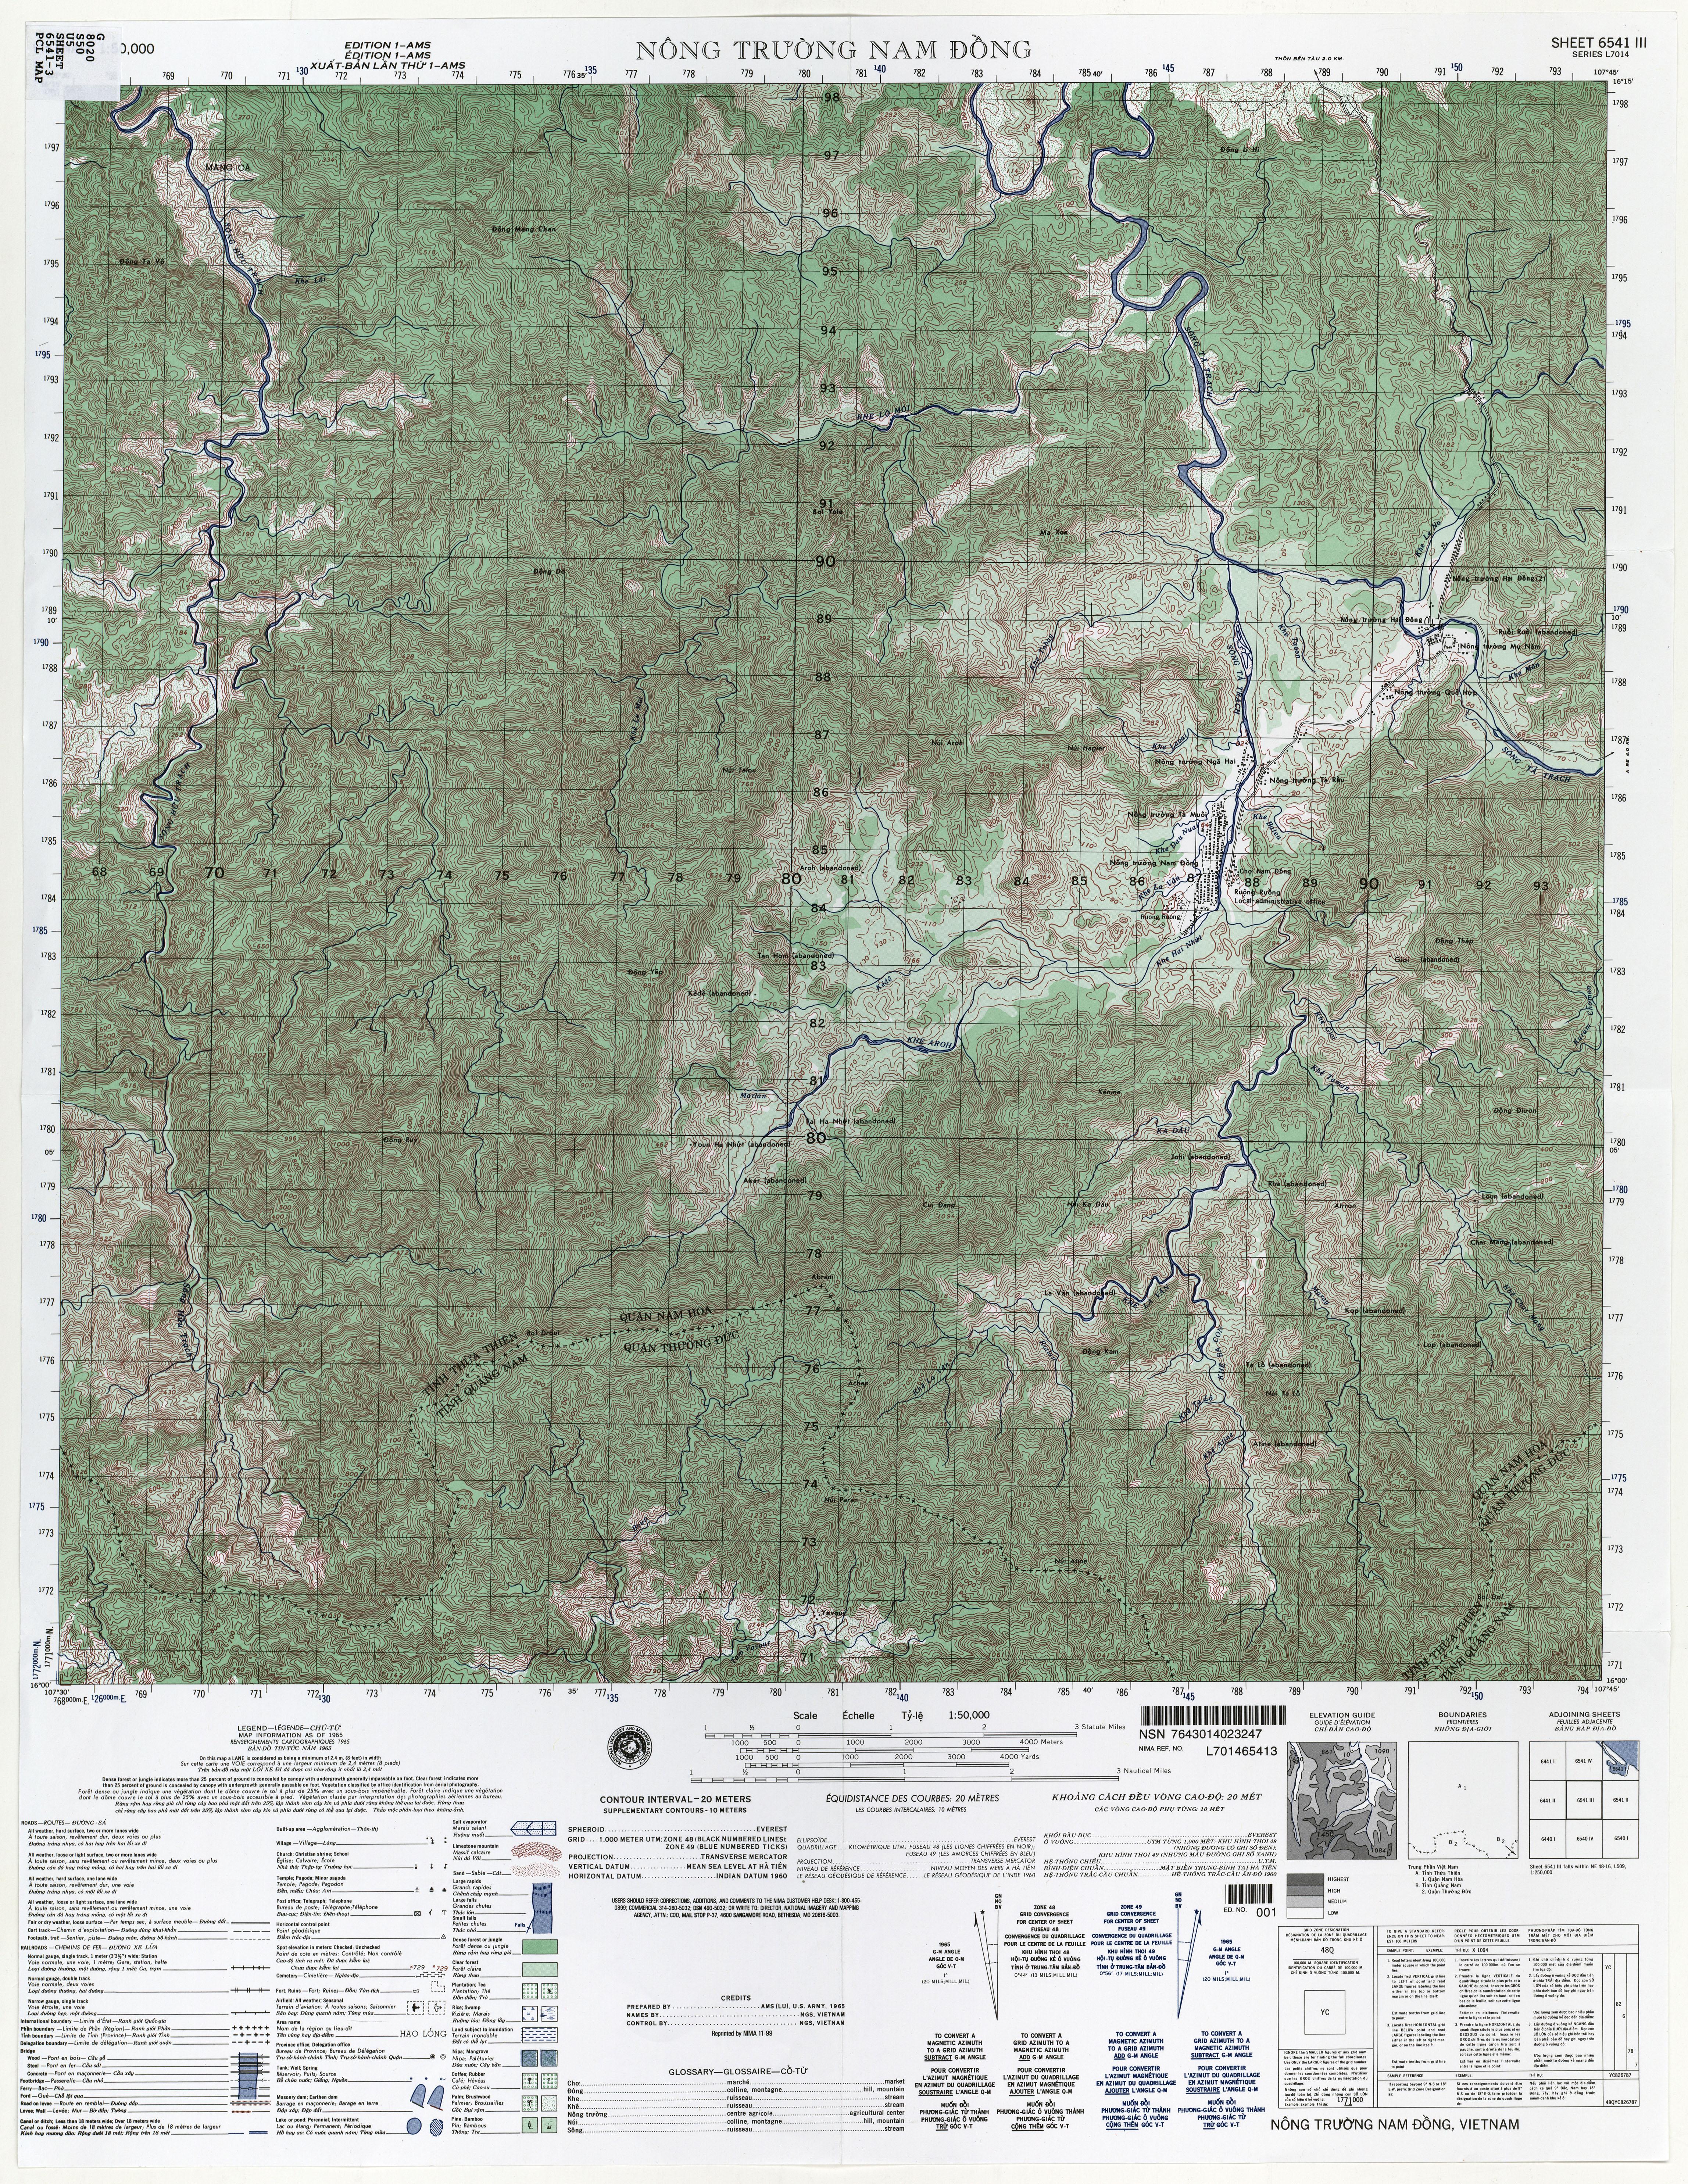 1 50 000 U S Army Map Service 1965 11 0mb Jpeg